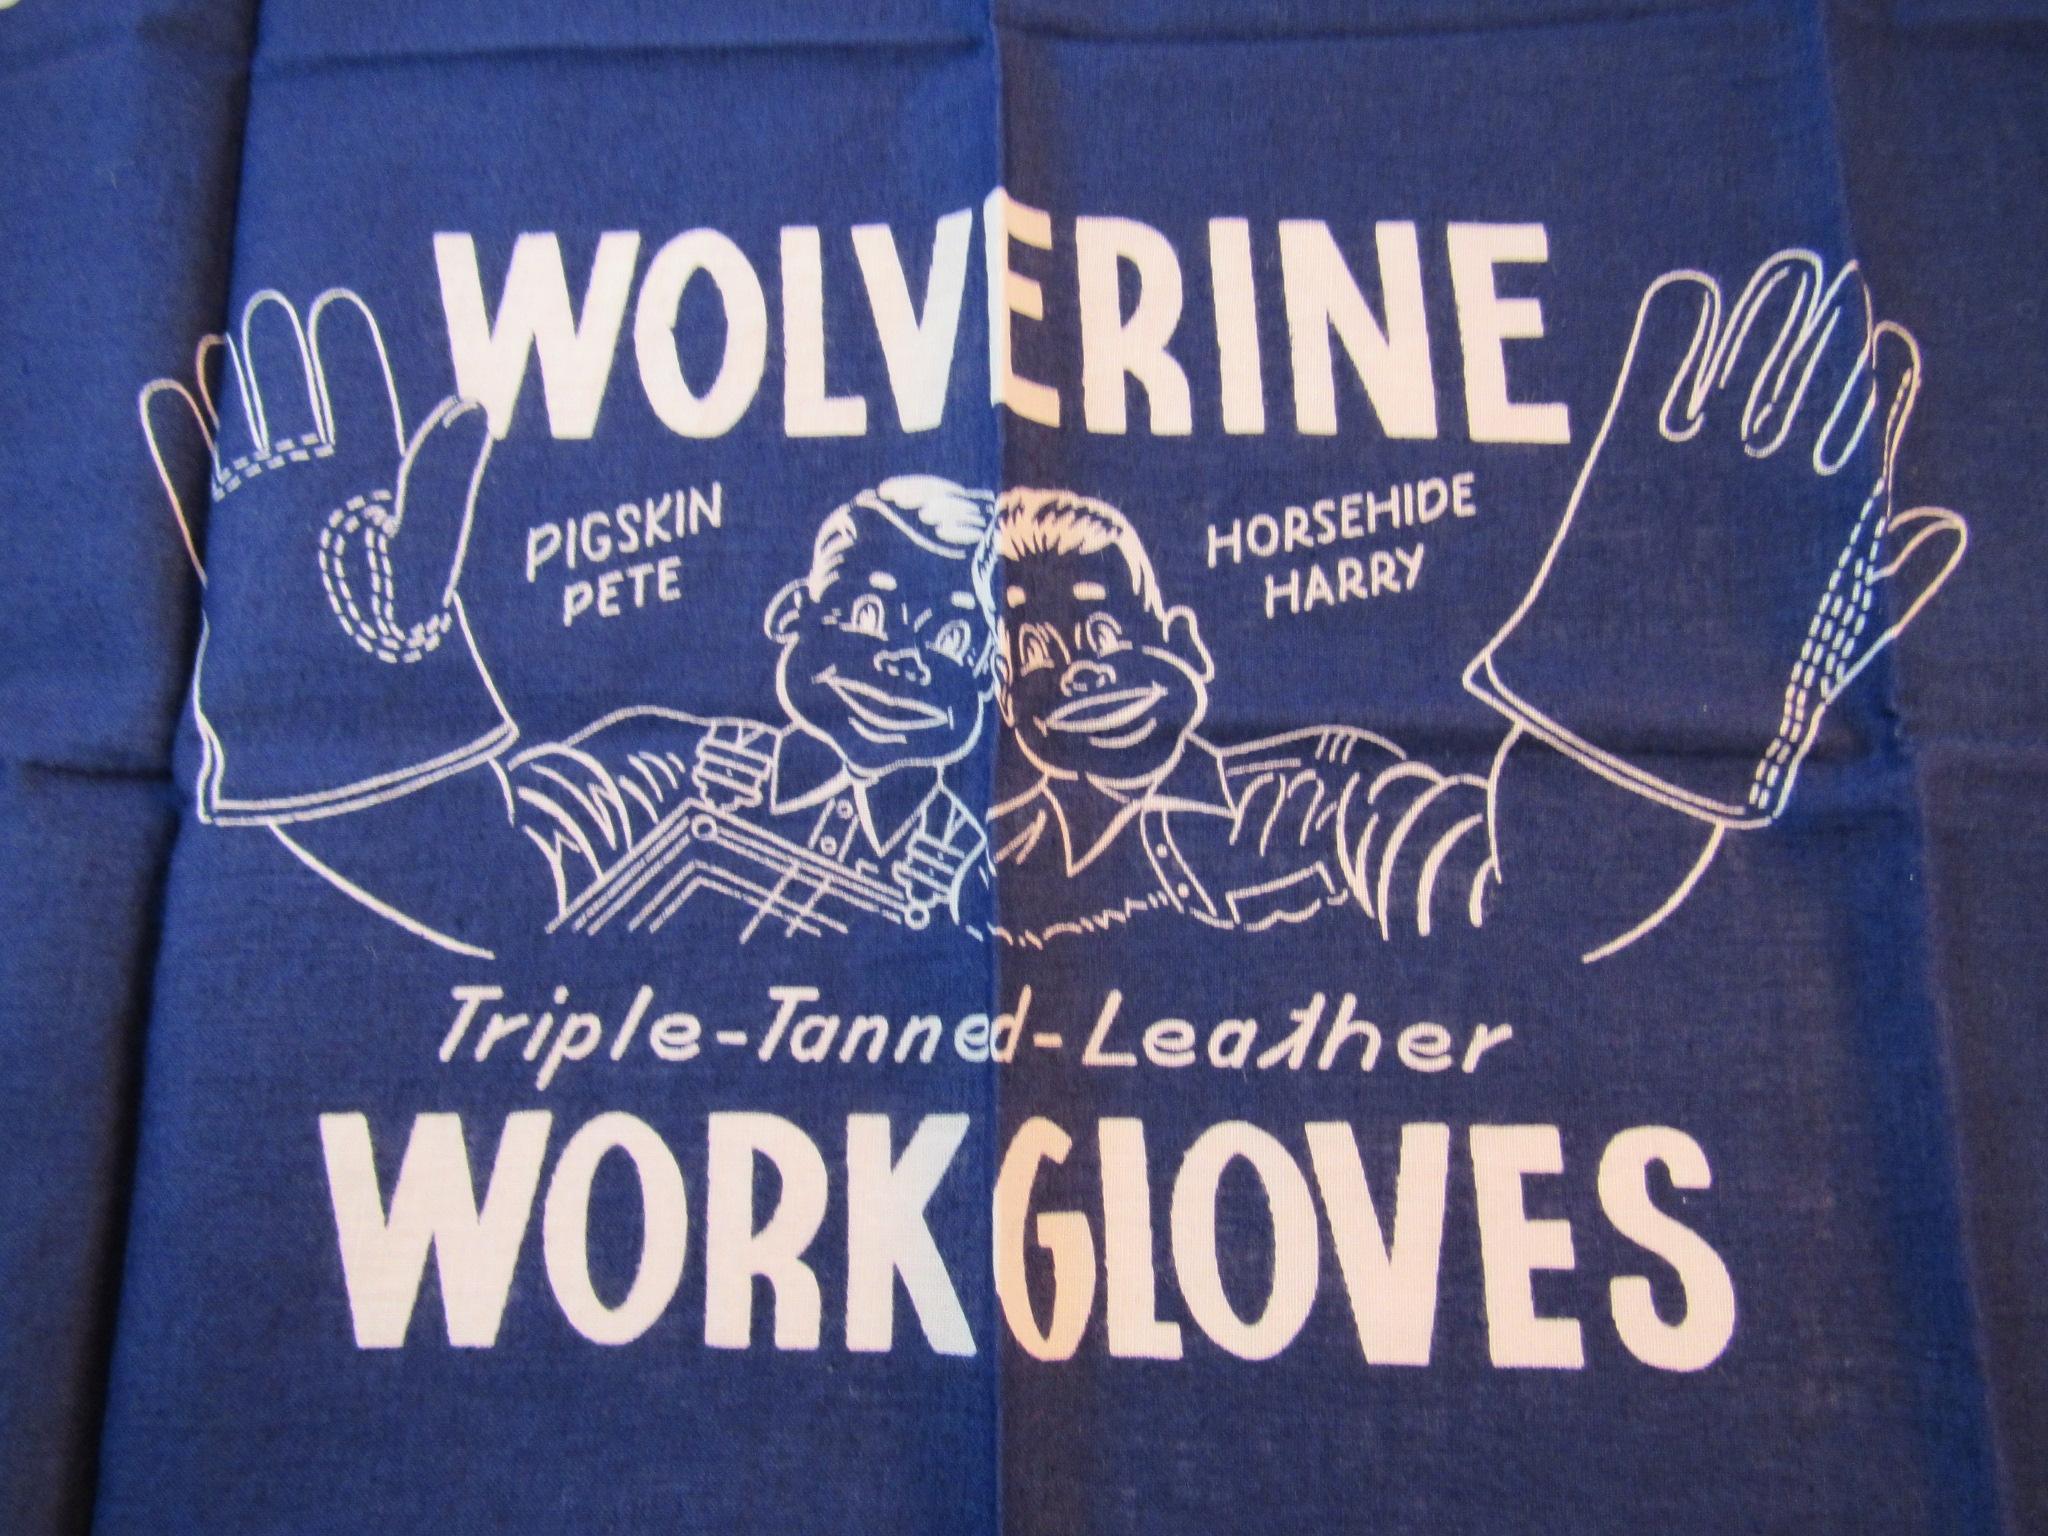 3pk wolverine leather work gloves extra large - Wolverine Work Gloves Life 11 14 1955 P 169